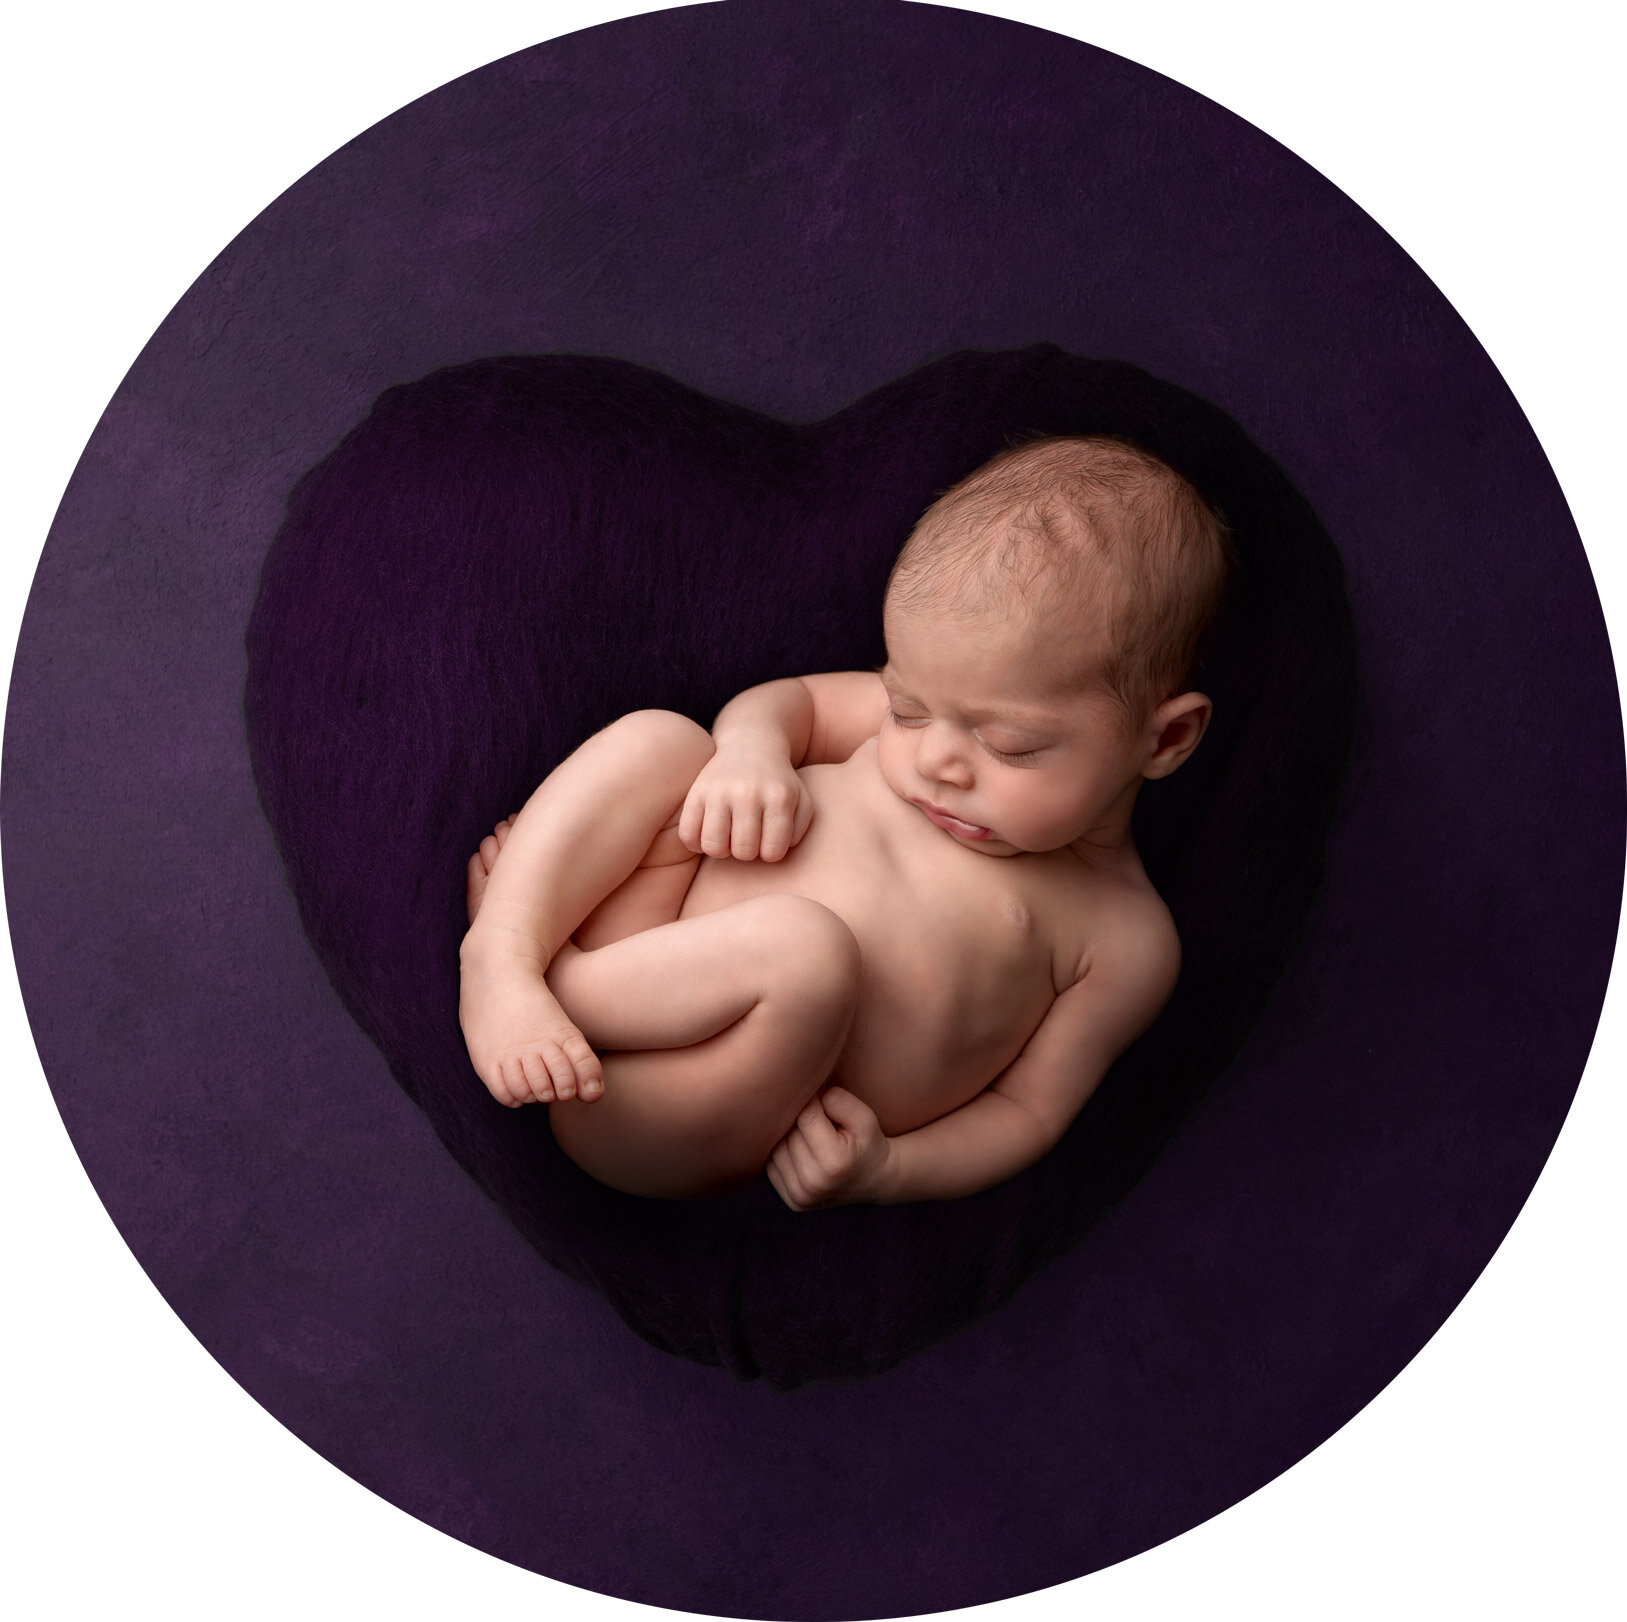 newborn baby girl lays asleep curled up on a giant purple heart shaped cushion at her newborn photo shoot in hemel hempstead